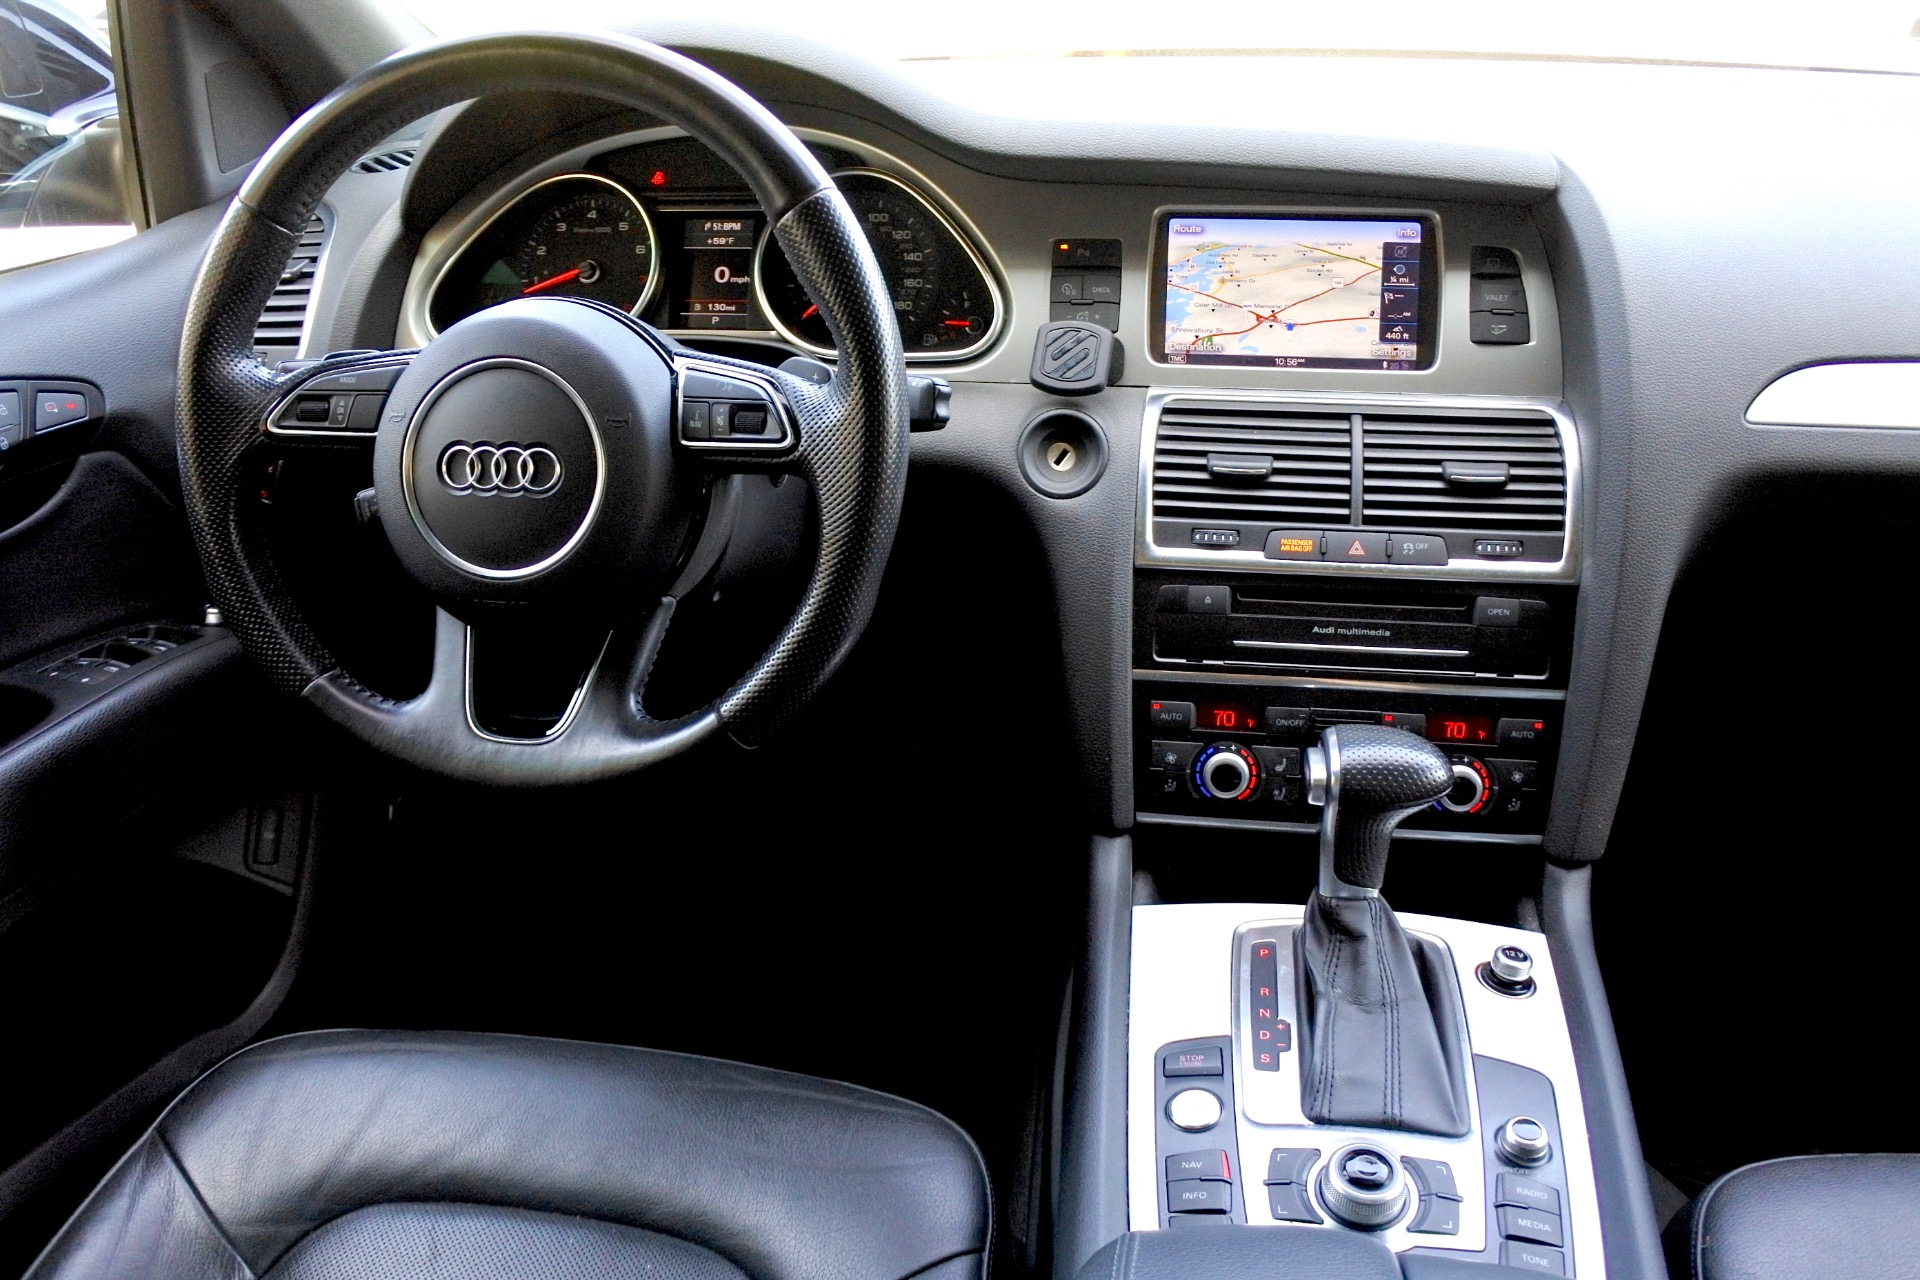 Used 2014 Audi Q7 3.0T S line Prestige Used 2014 Audi Q7 3.0T S line Prestige for sale  at Metro West Motorcars LLC in Shrewsbury MA 9